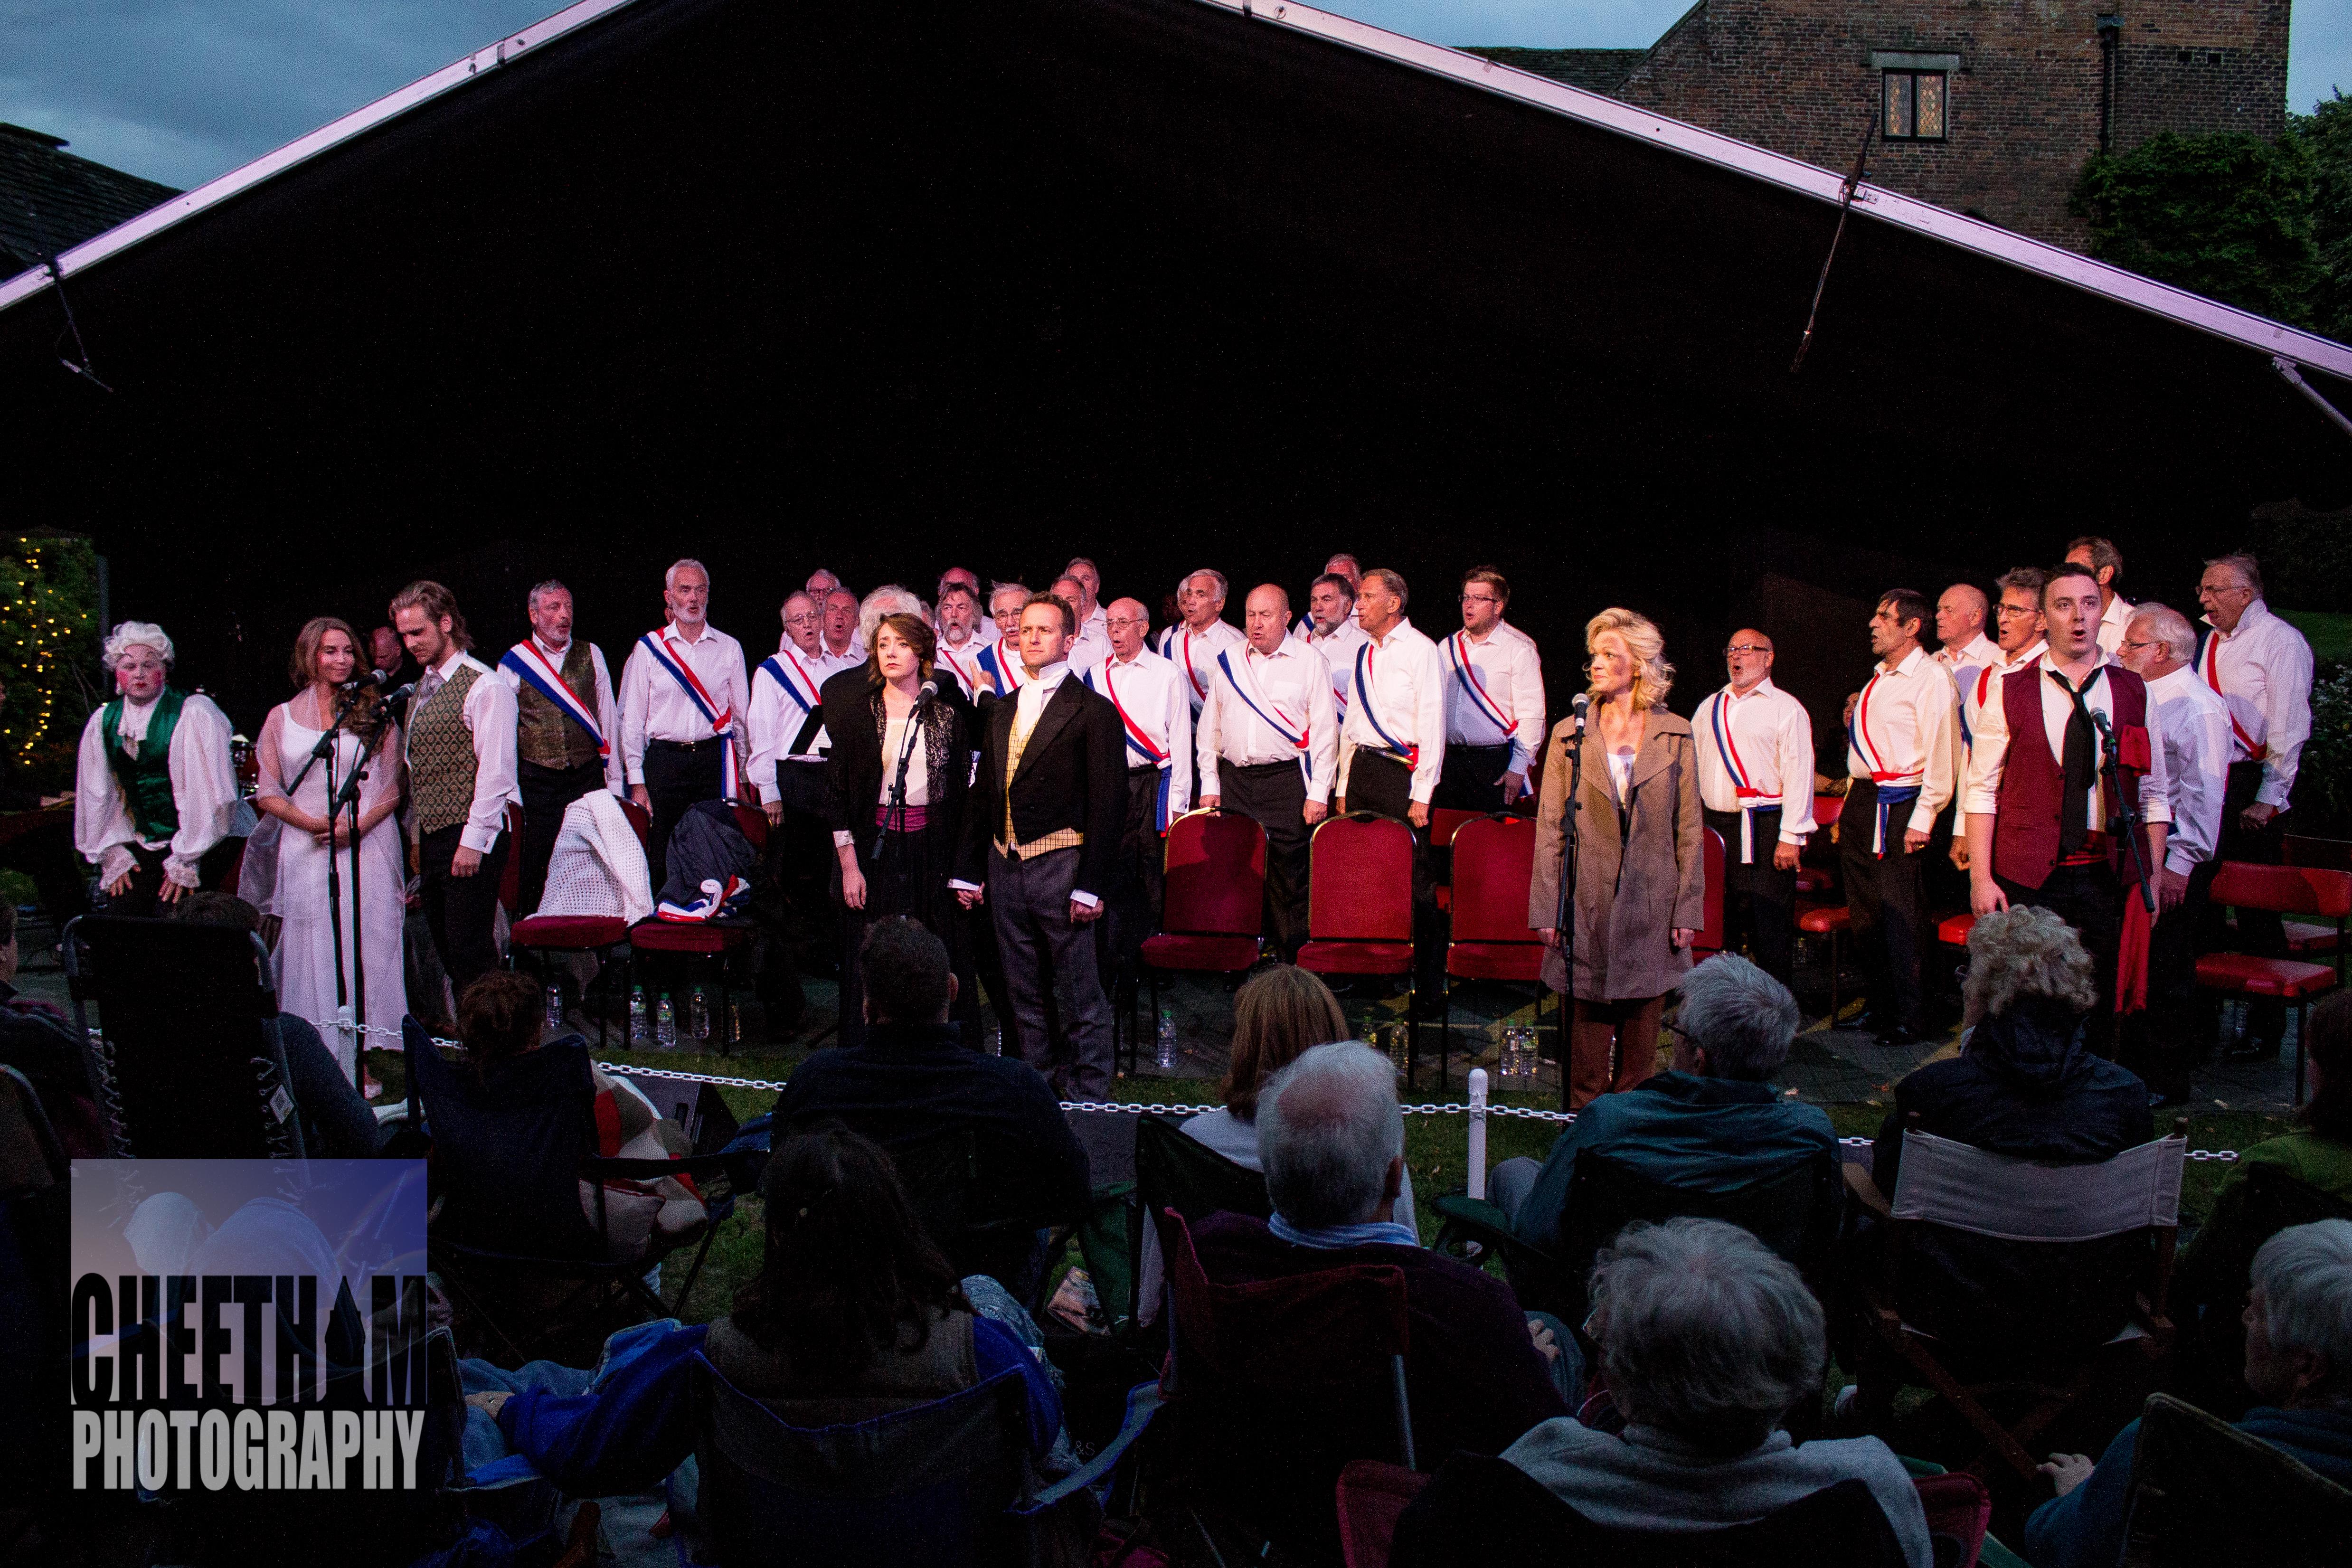 Tideswell Choir